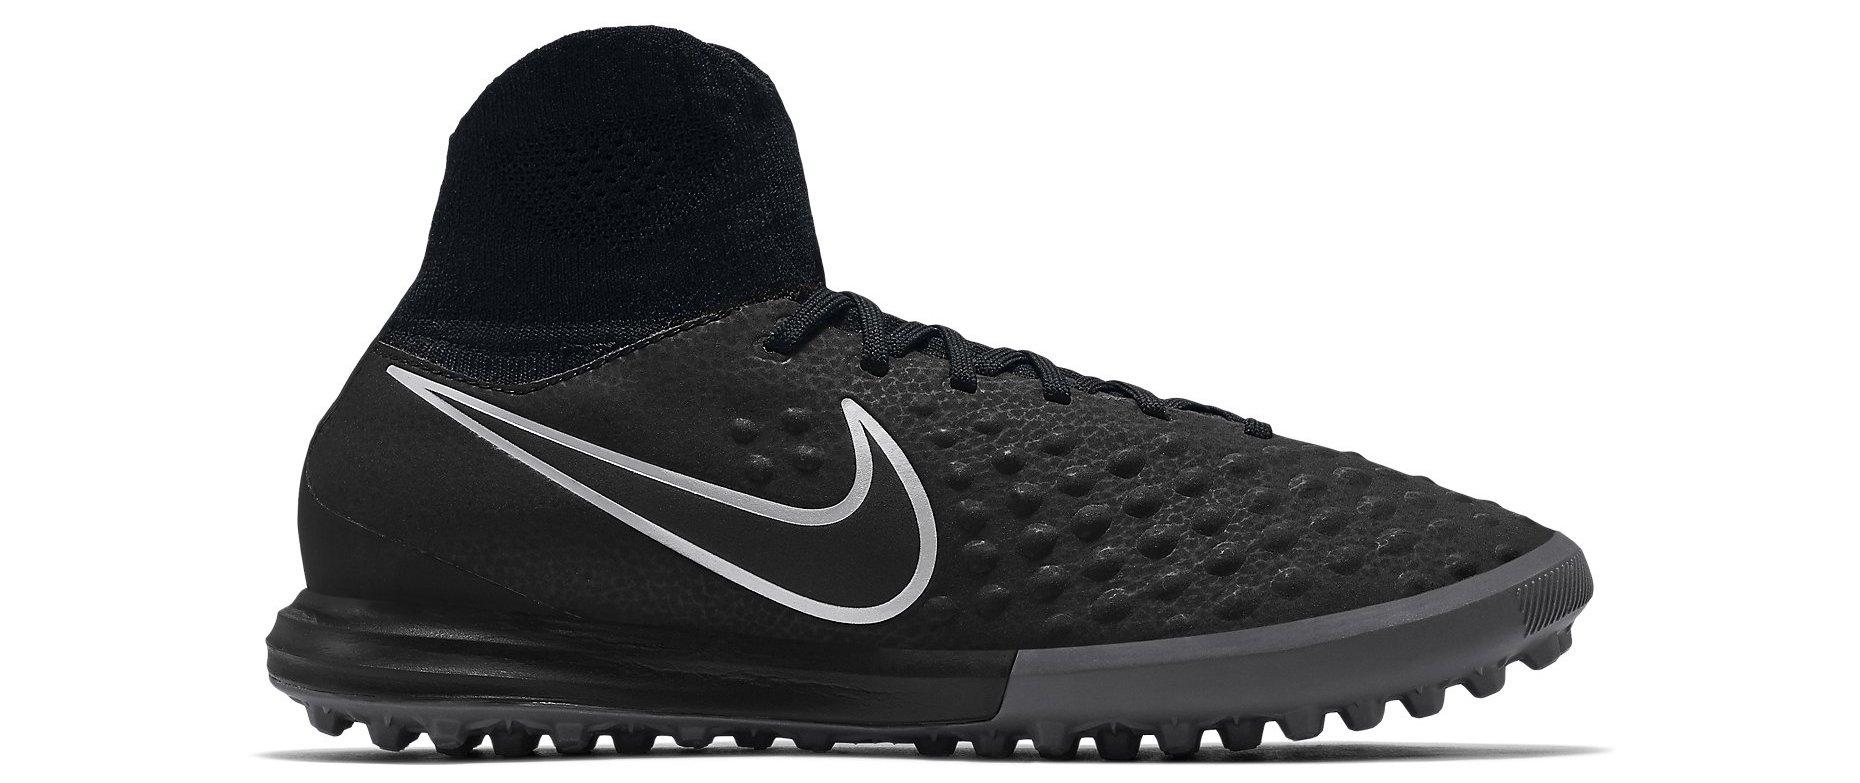 Kopačky Nike JR MagistaX Proximo II TF